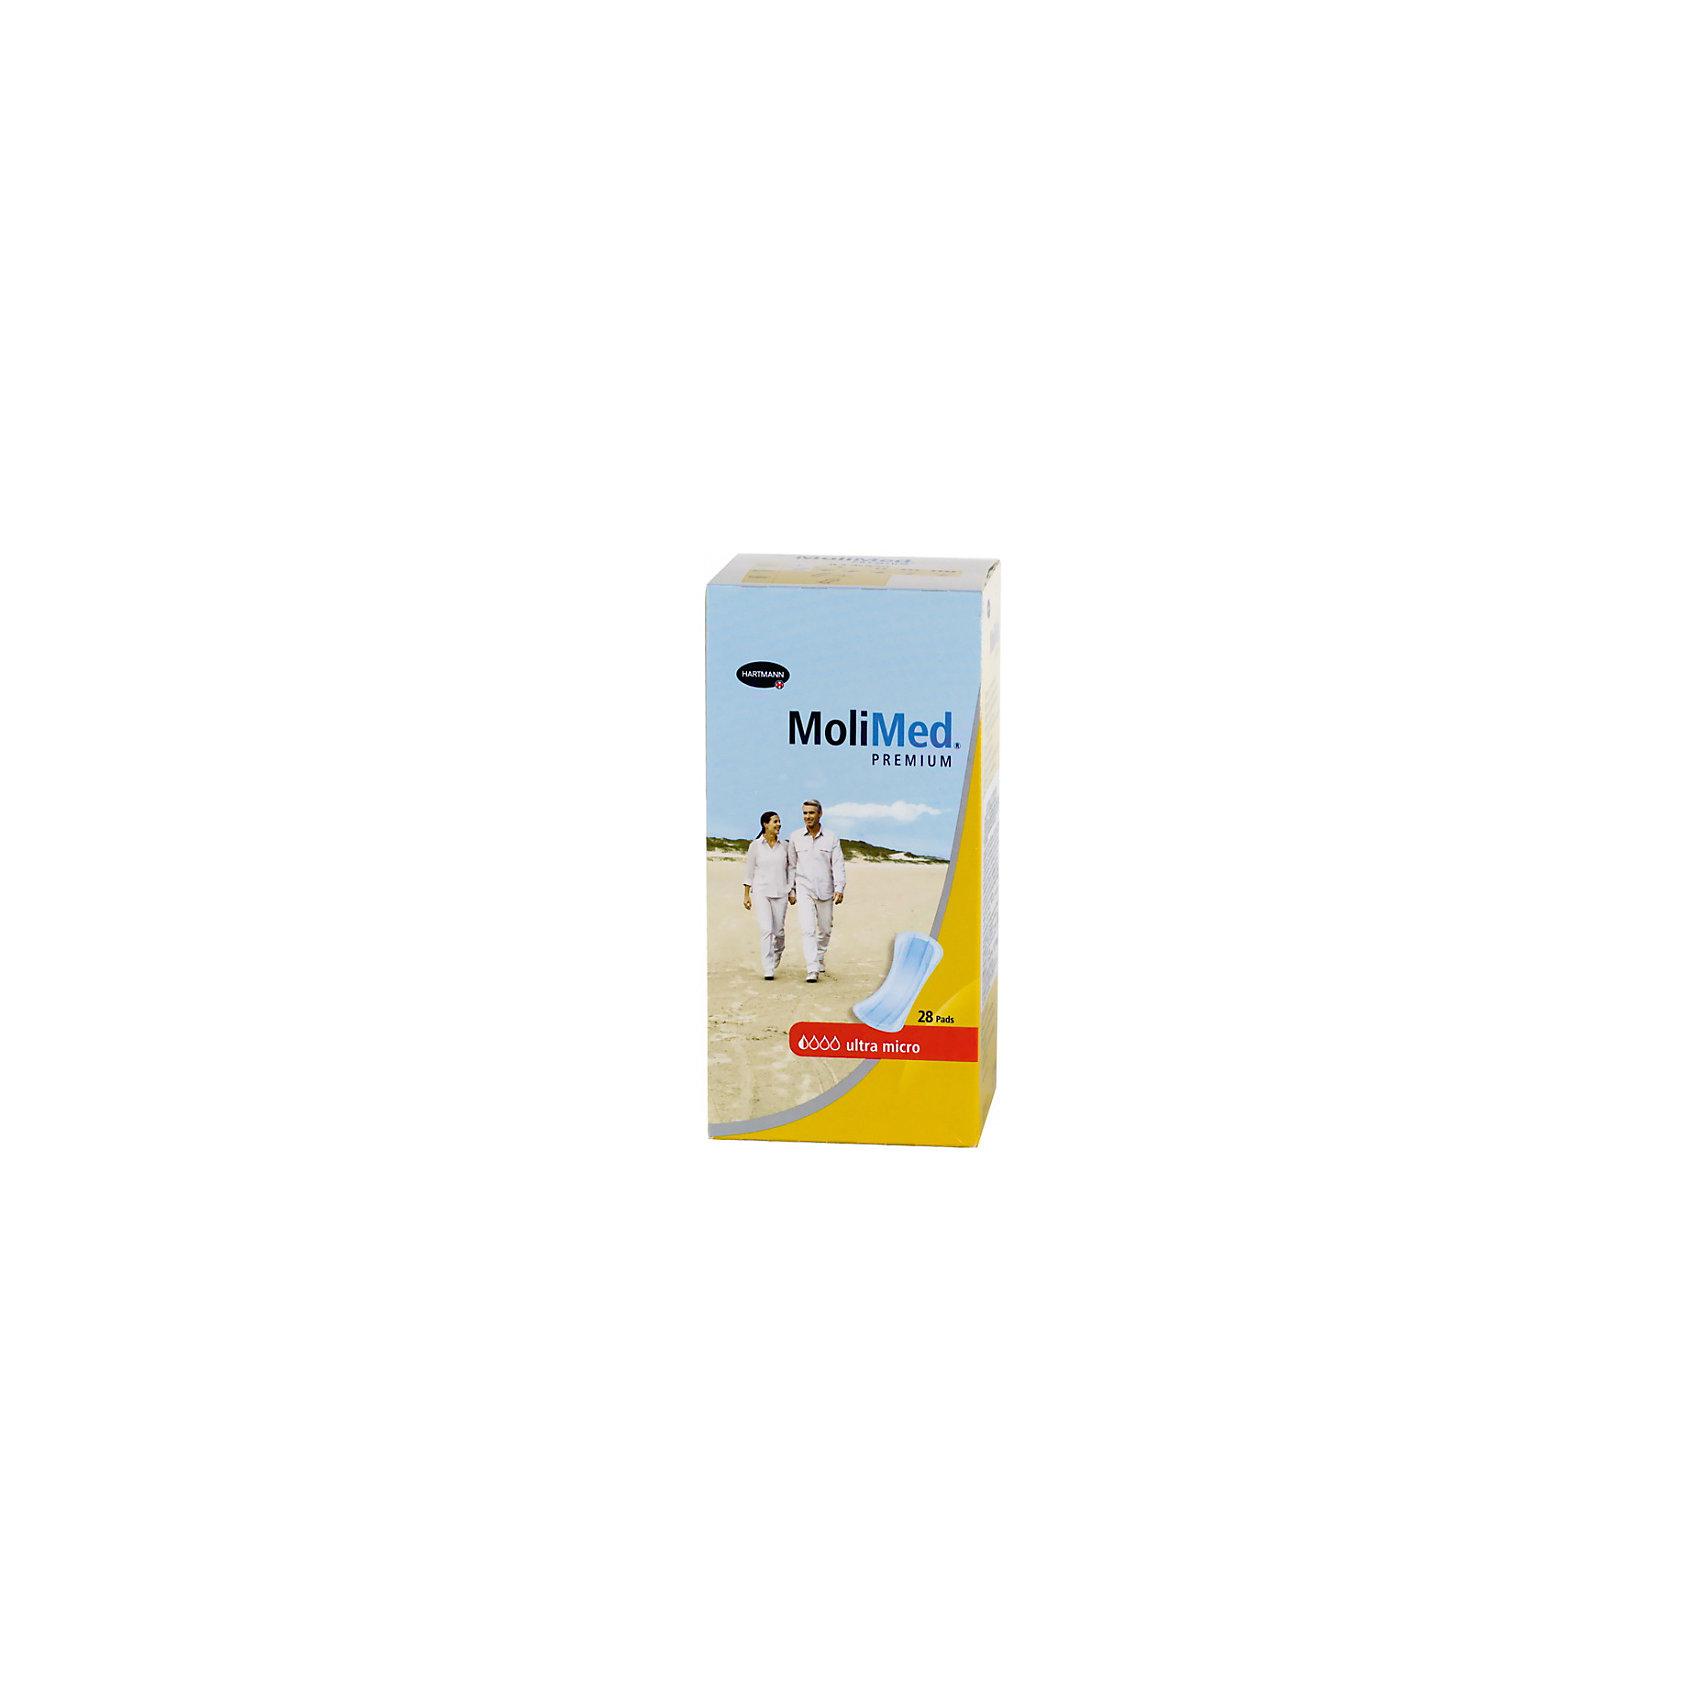 Прокладки MoliMed Premium ultra micro впитываемость 80 мл. (28шт.), Hartmann